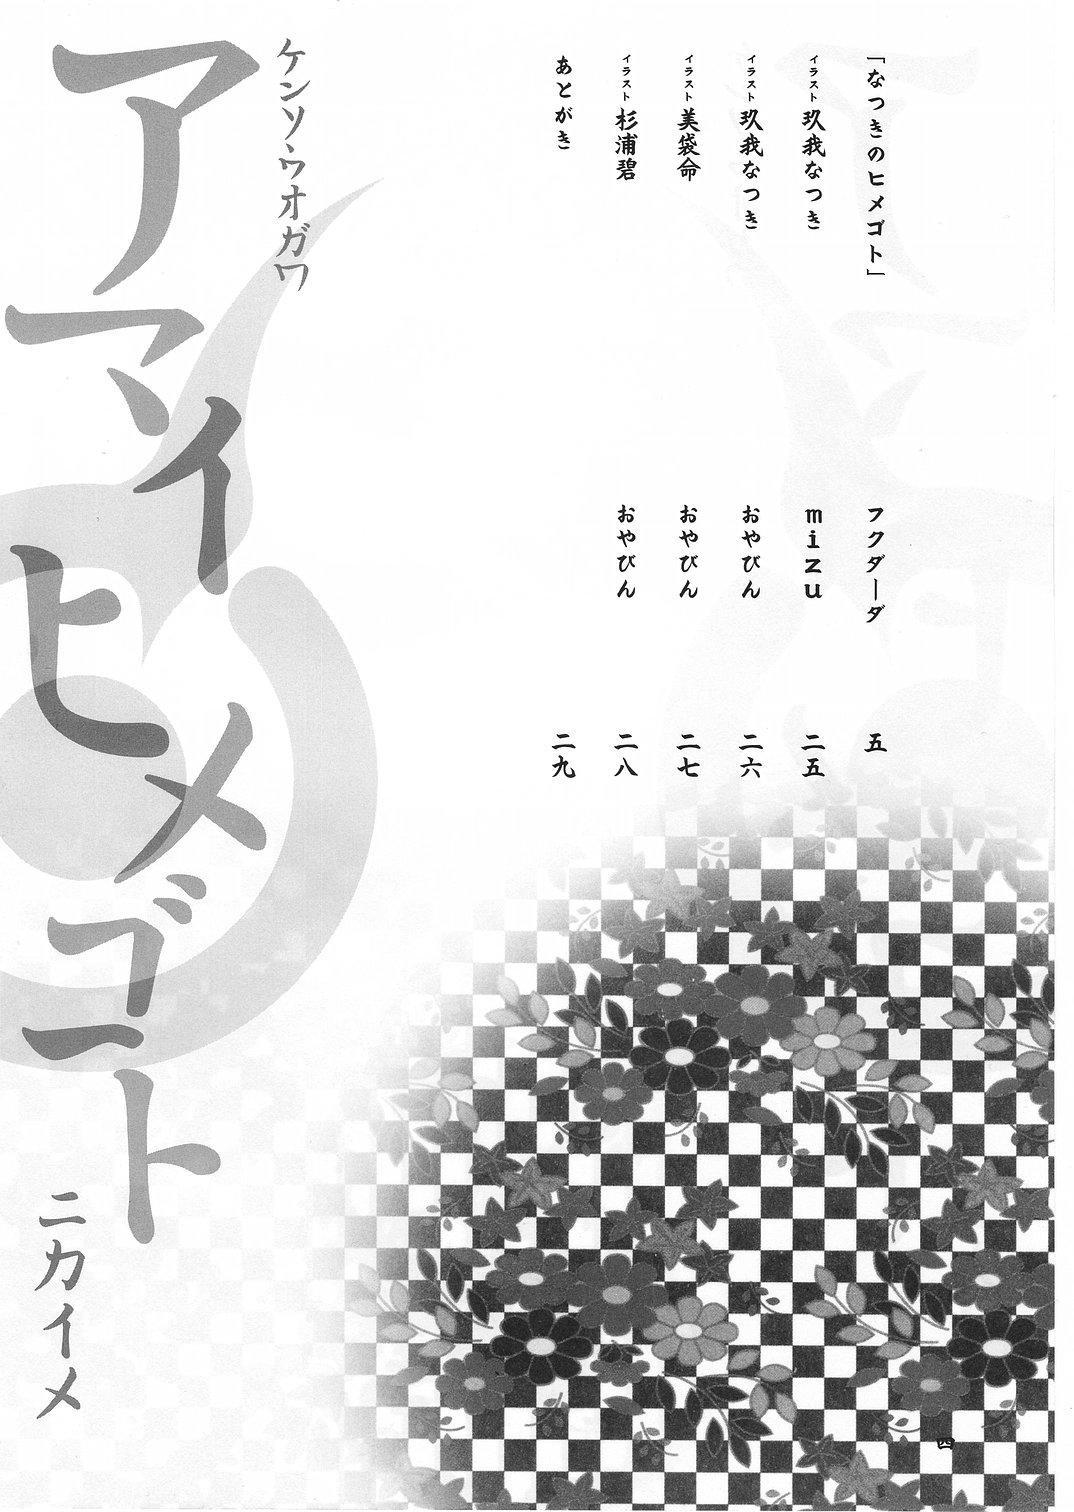 Amai Himegoto Nikaime 2